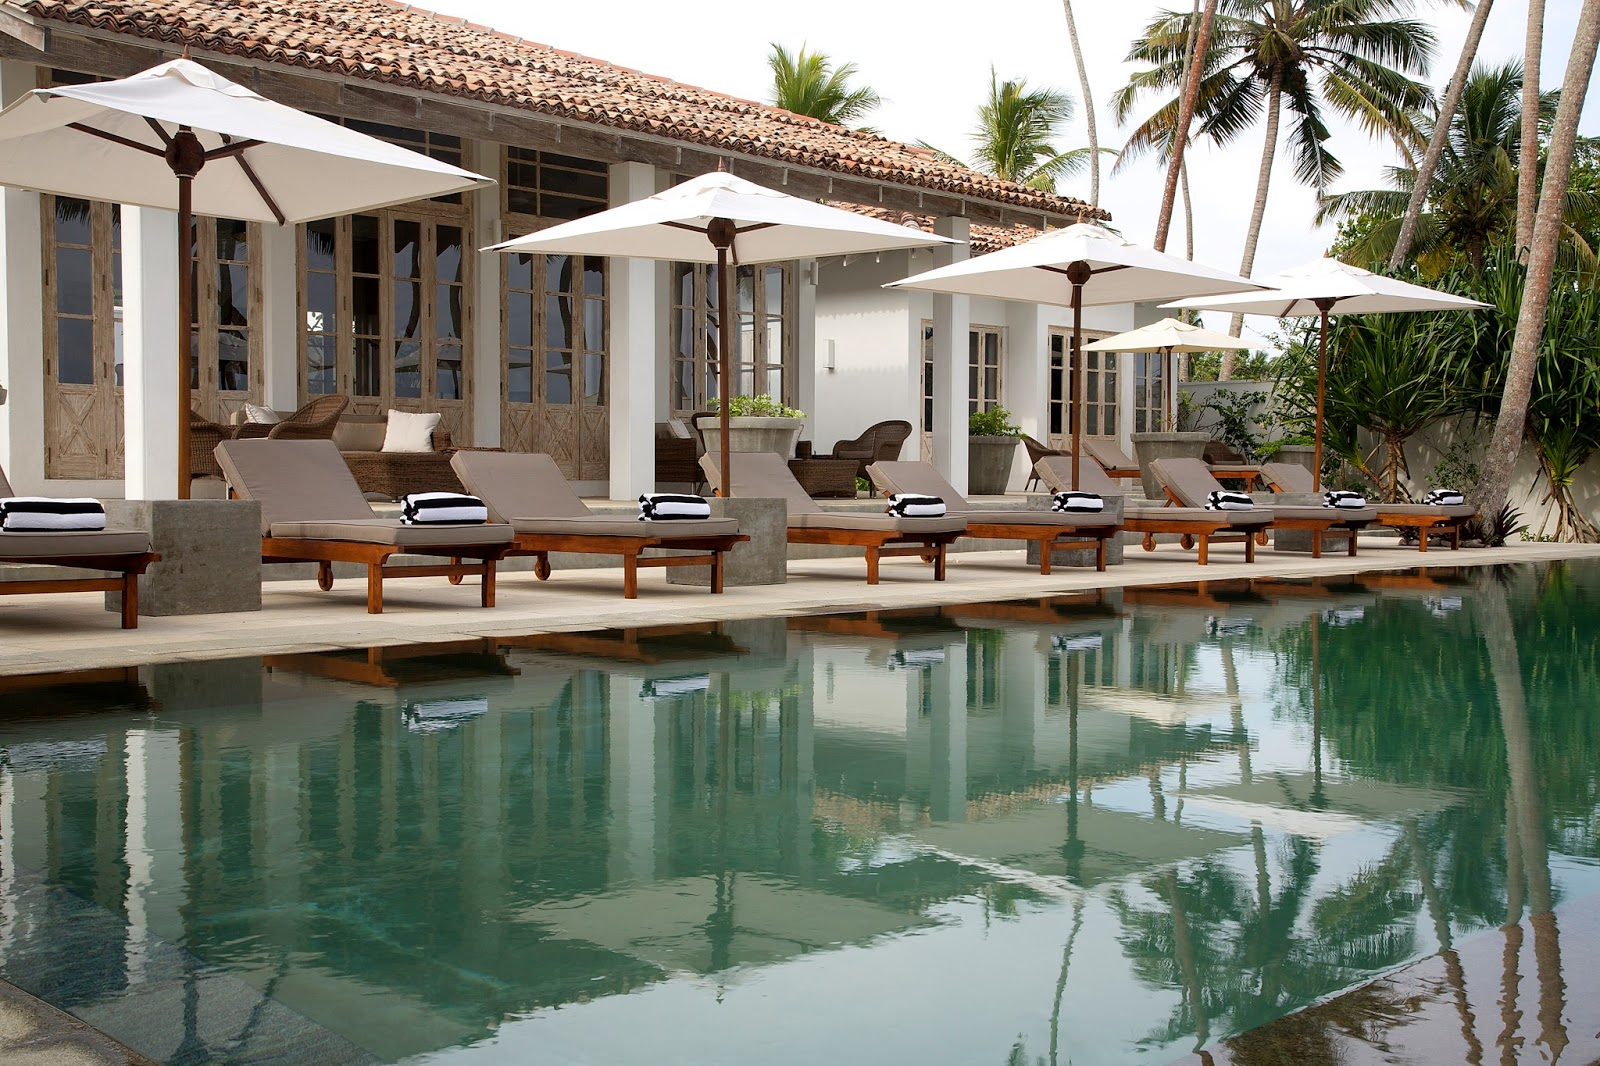 Habaraduwa Sri Lanka  city pictures gallery : ... Habaraduwa House Sri Lanka In Style | Holidays to Sri Lanka